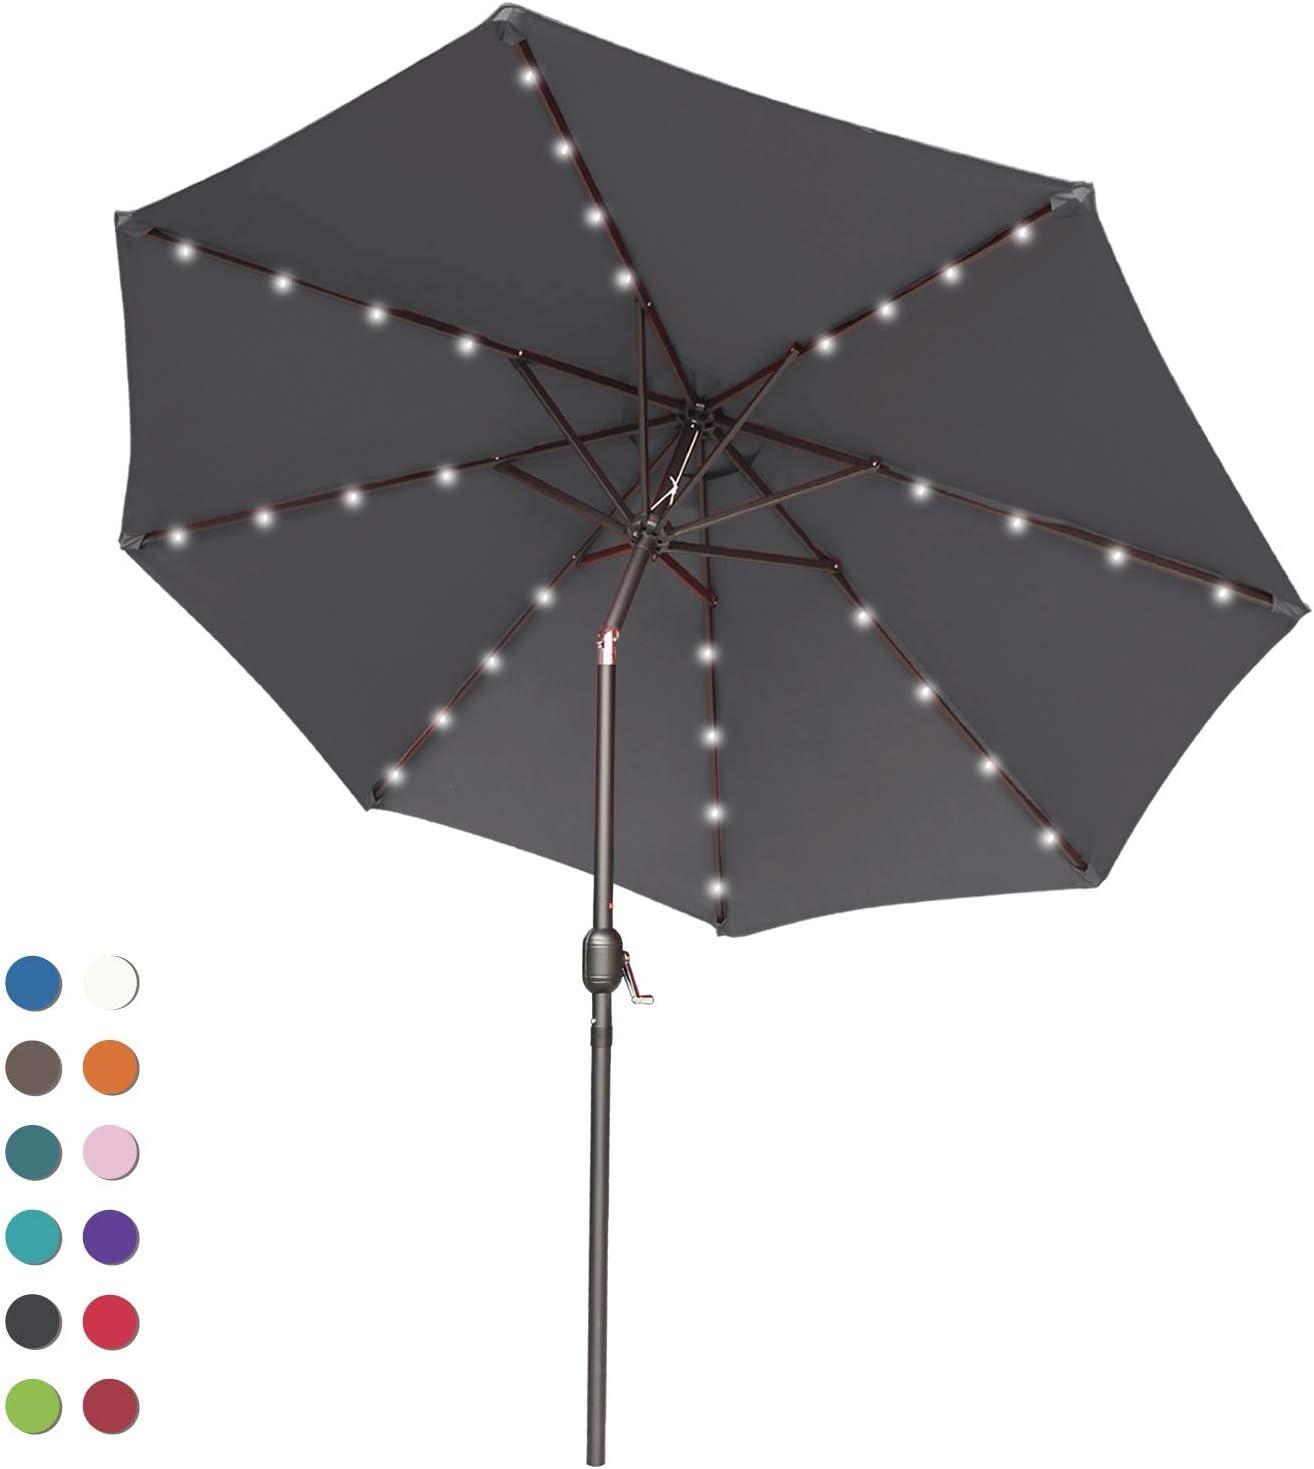 ABCCANOPY Patio Umbrella Ourdoor Solar Umbrella LED Umbrellas with 32LED Lights, Tilt and Crank Table Umbrellas for Garden, Deck, Backyard and Pool,12+Colors, (Dark Gray)